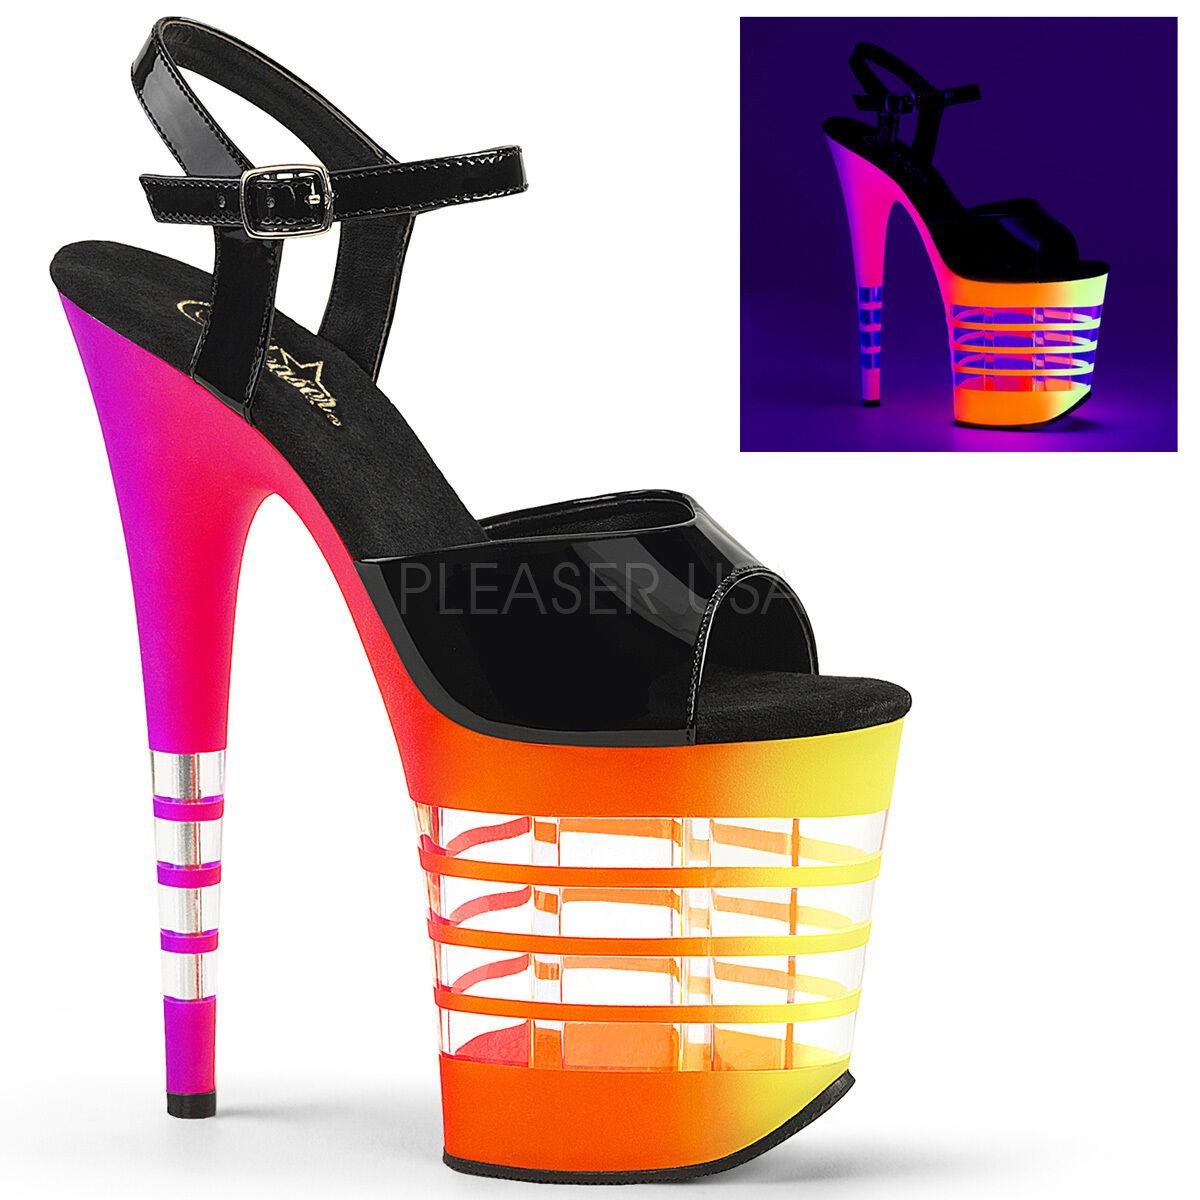 Pleaser FLAMINGO-808UVLN Neon FLAMINGO-809UVLN Neon FLAMINGO-808UVLN UV Platform Sandale 61b806